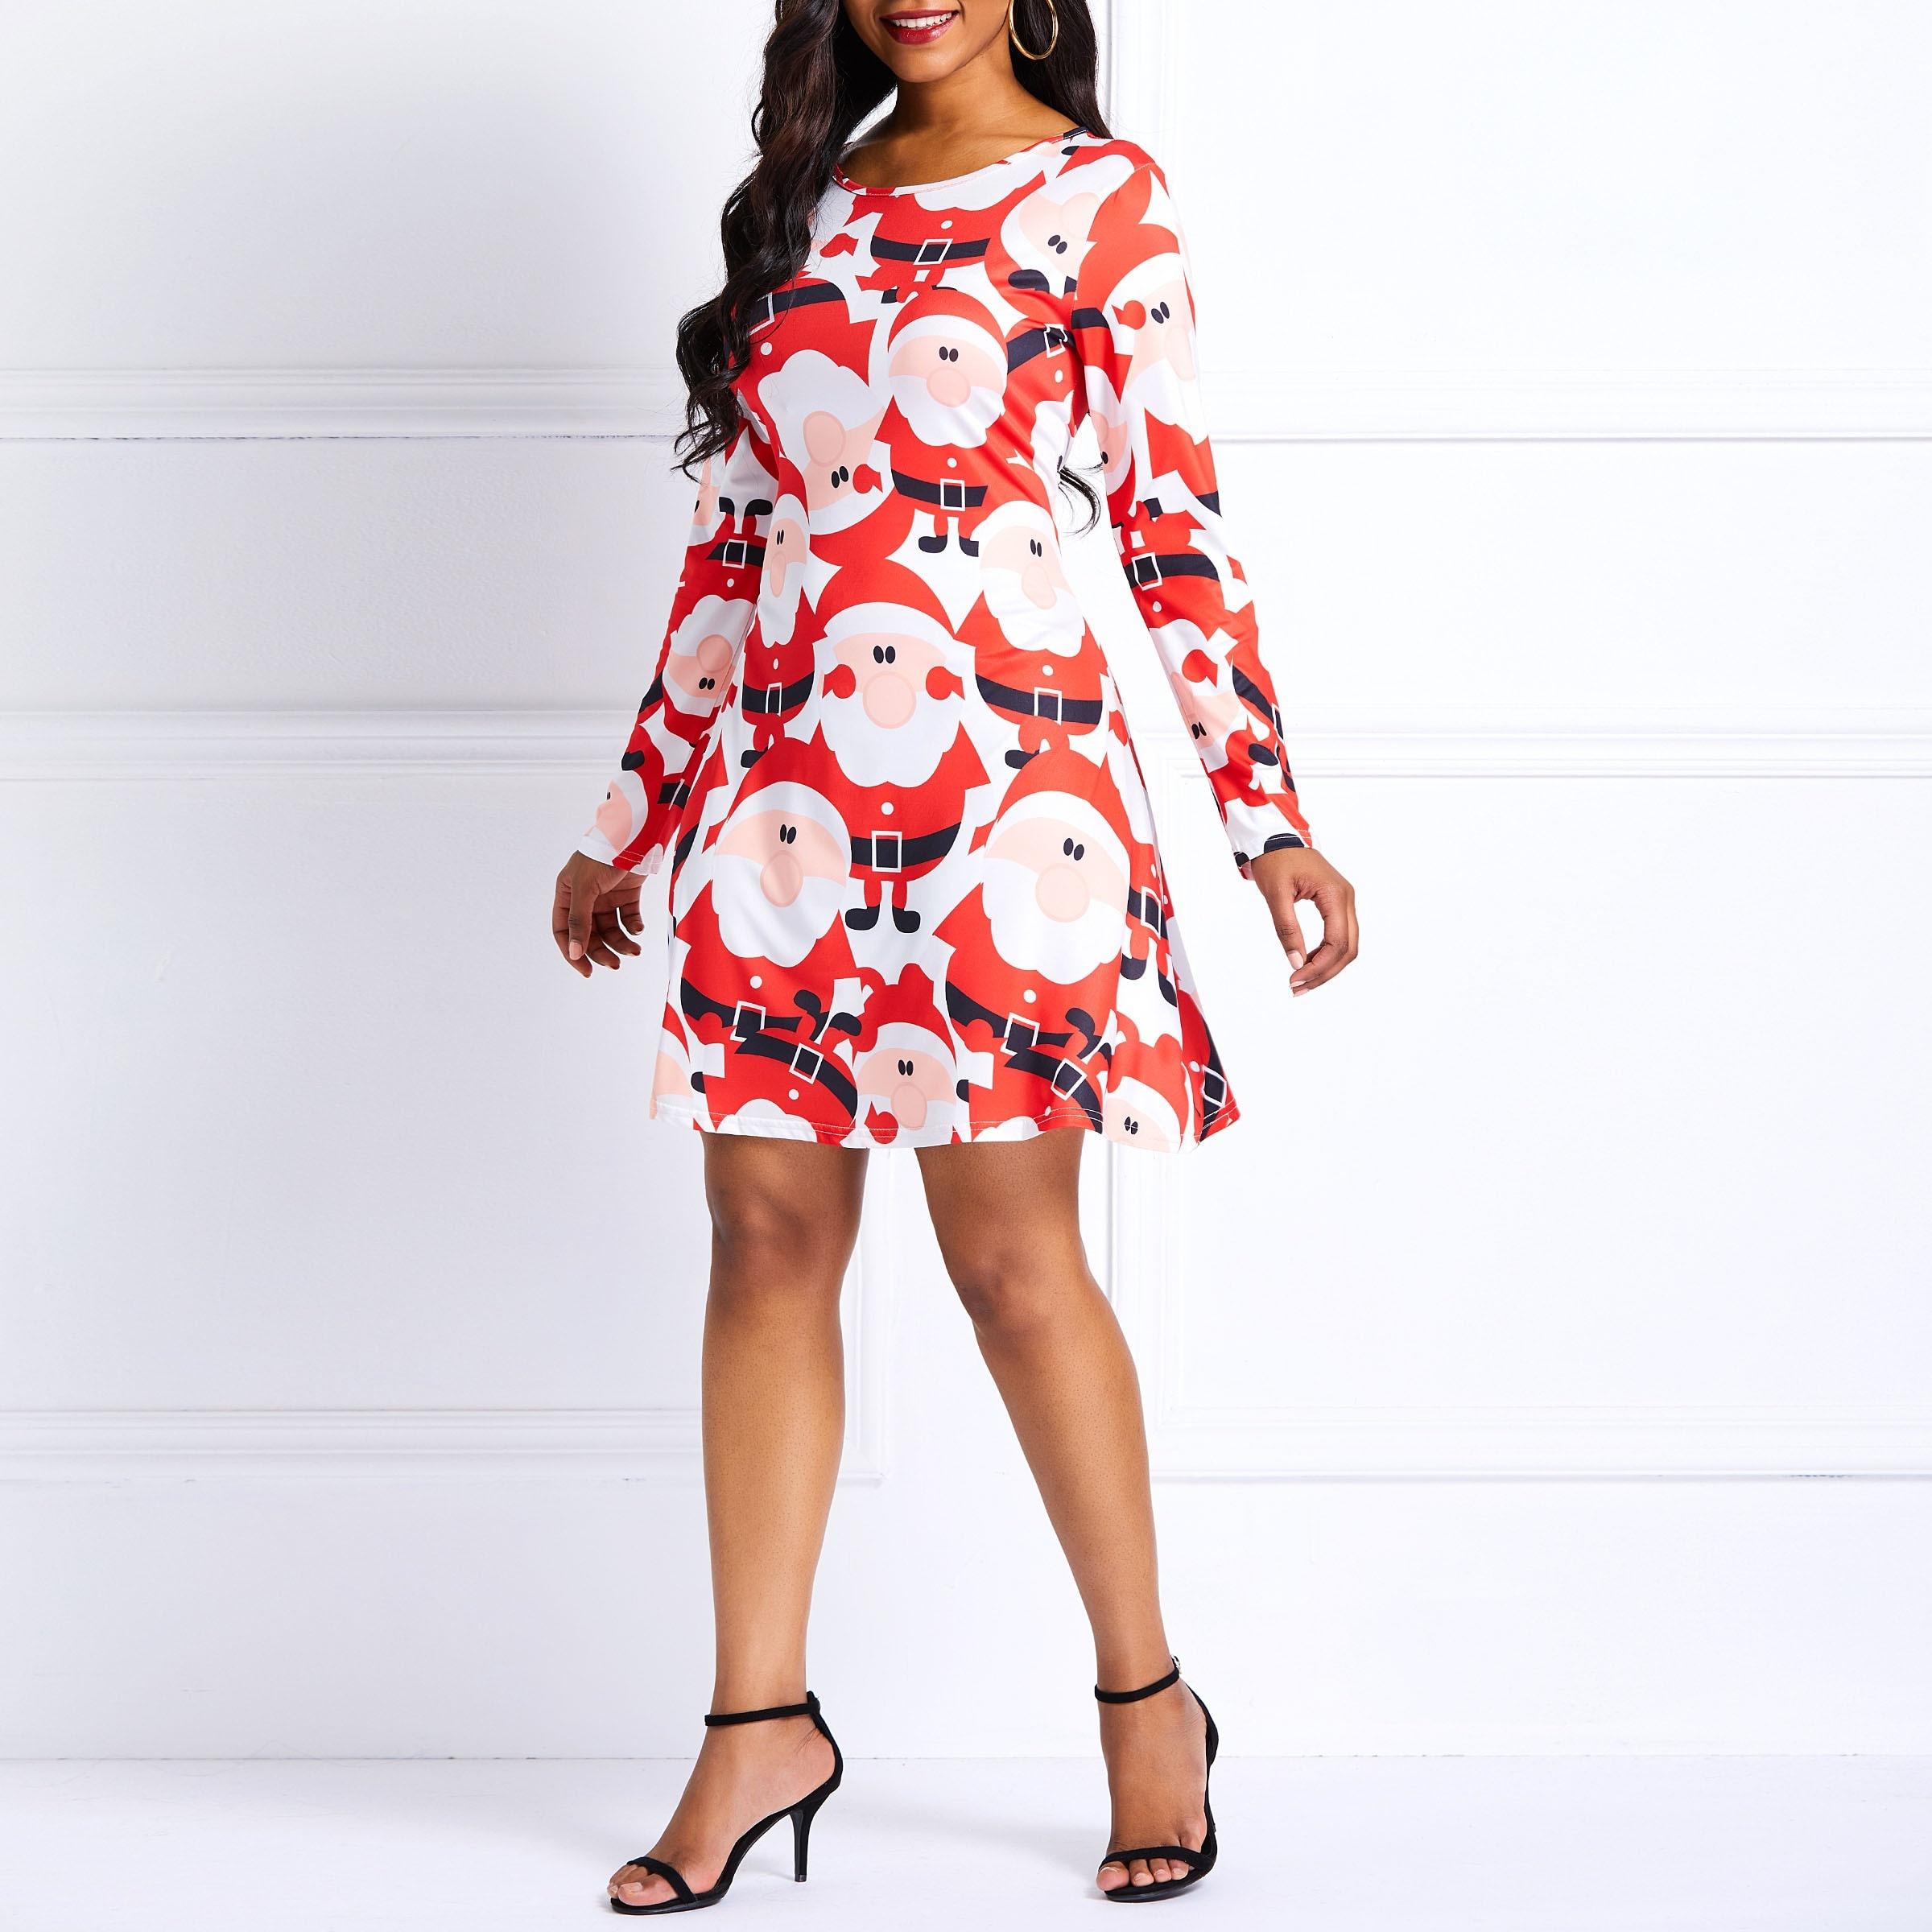 Women Mini Dresses Sweet Christmas Plus Size Aline Cartoon Print Female  Cute Elegant Fashion OL Preppy Style Cute Short Dress-in Dresses from  Women s ... 402f1ea1584e